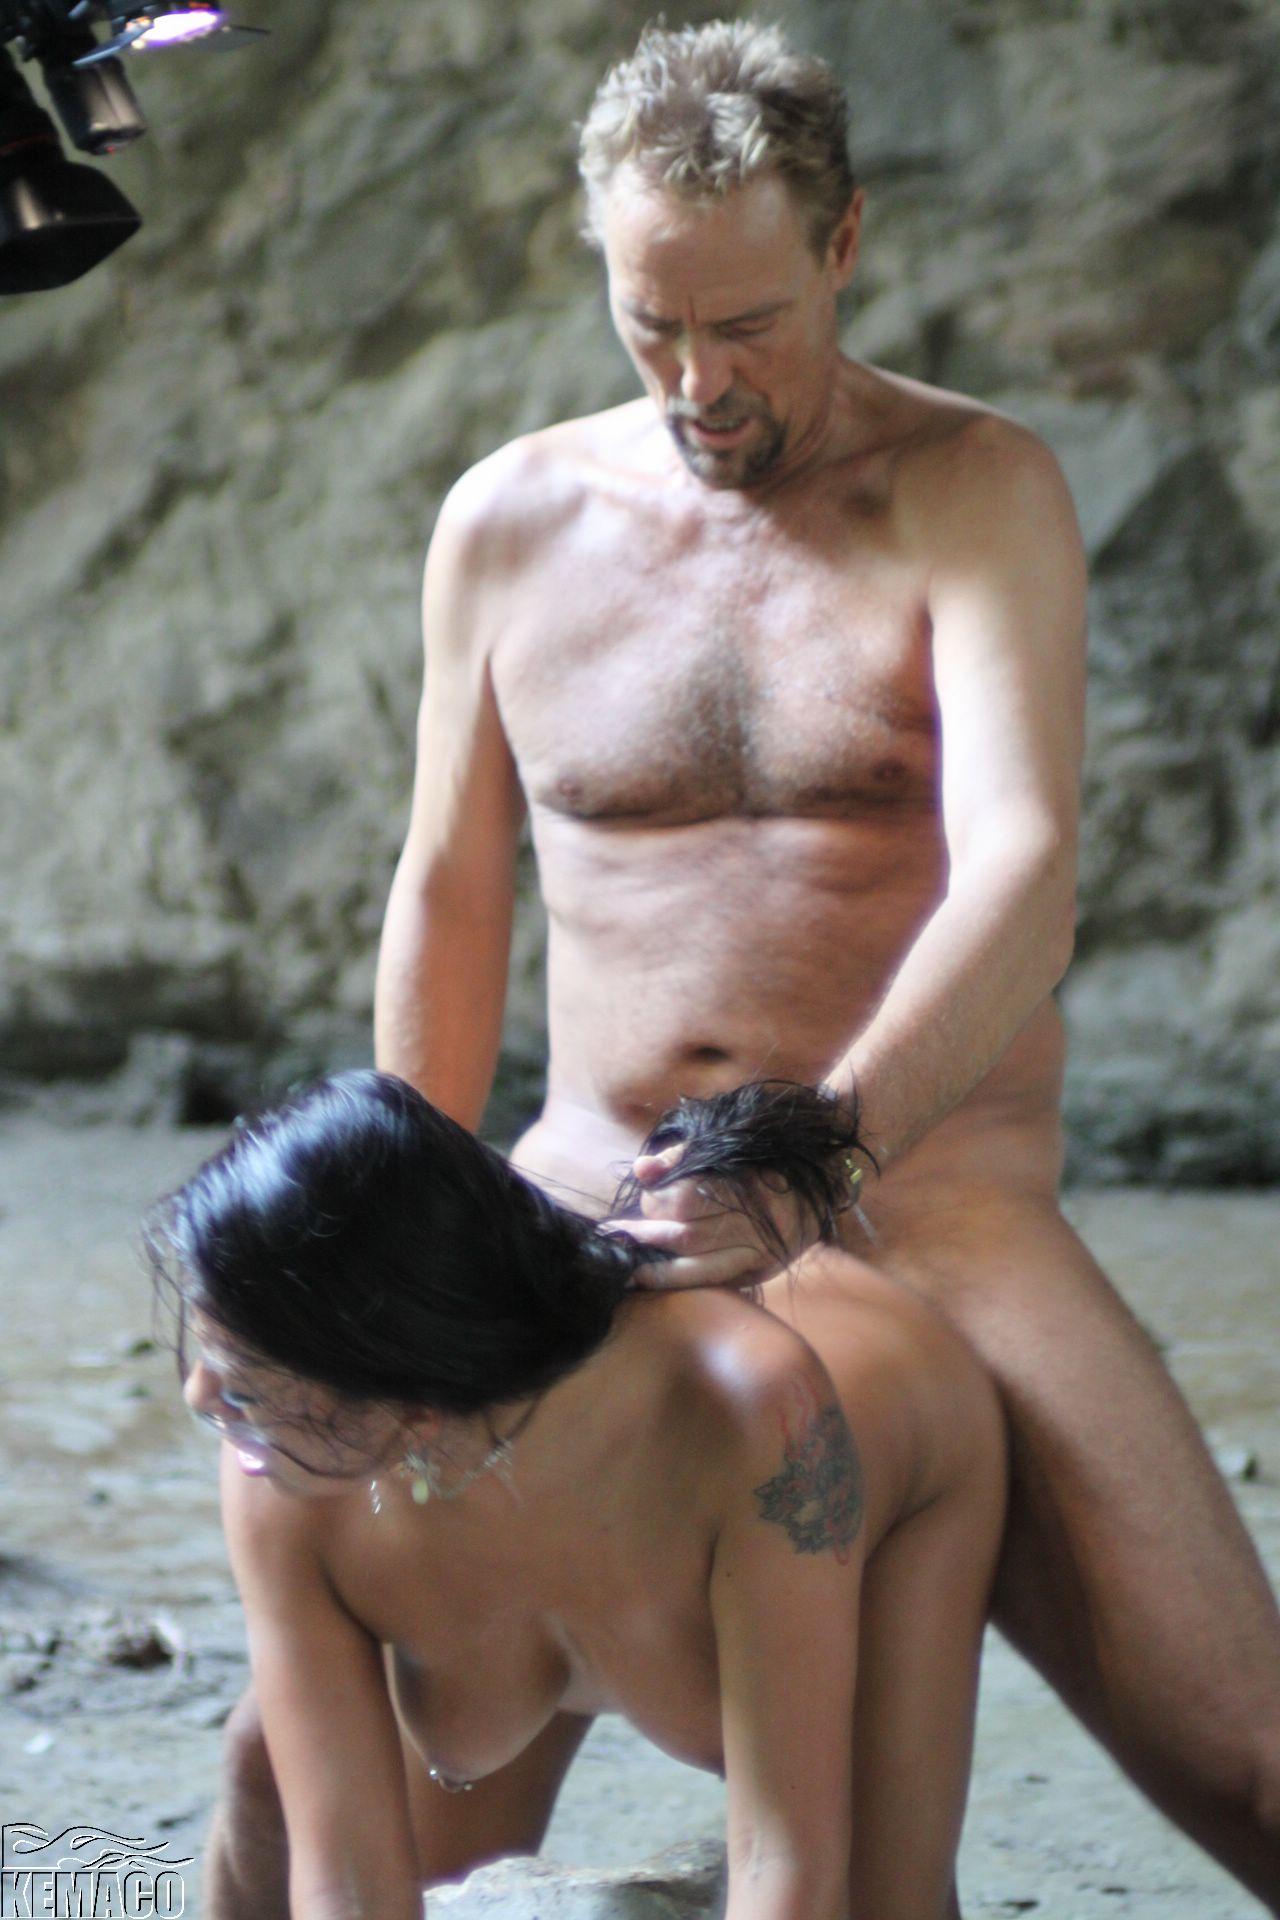 Horst baron porn